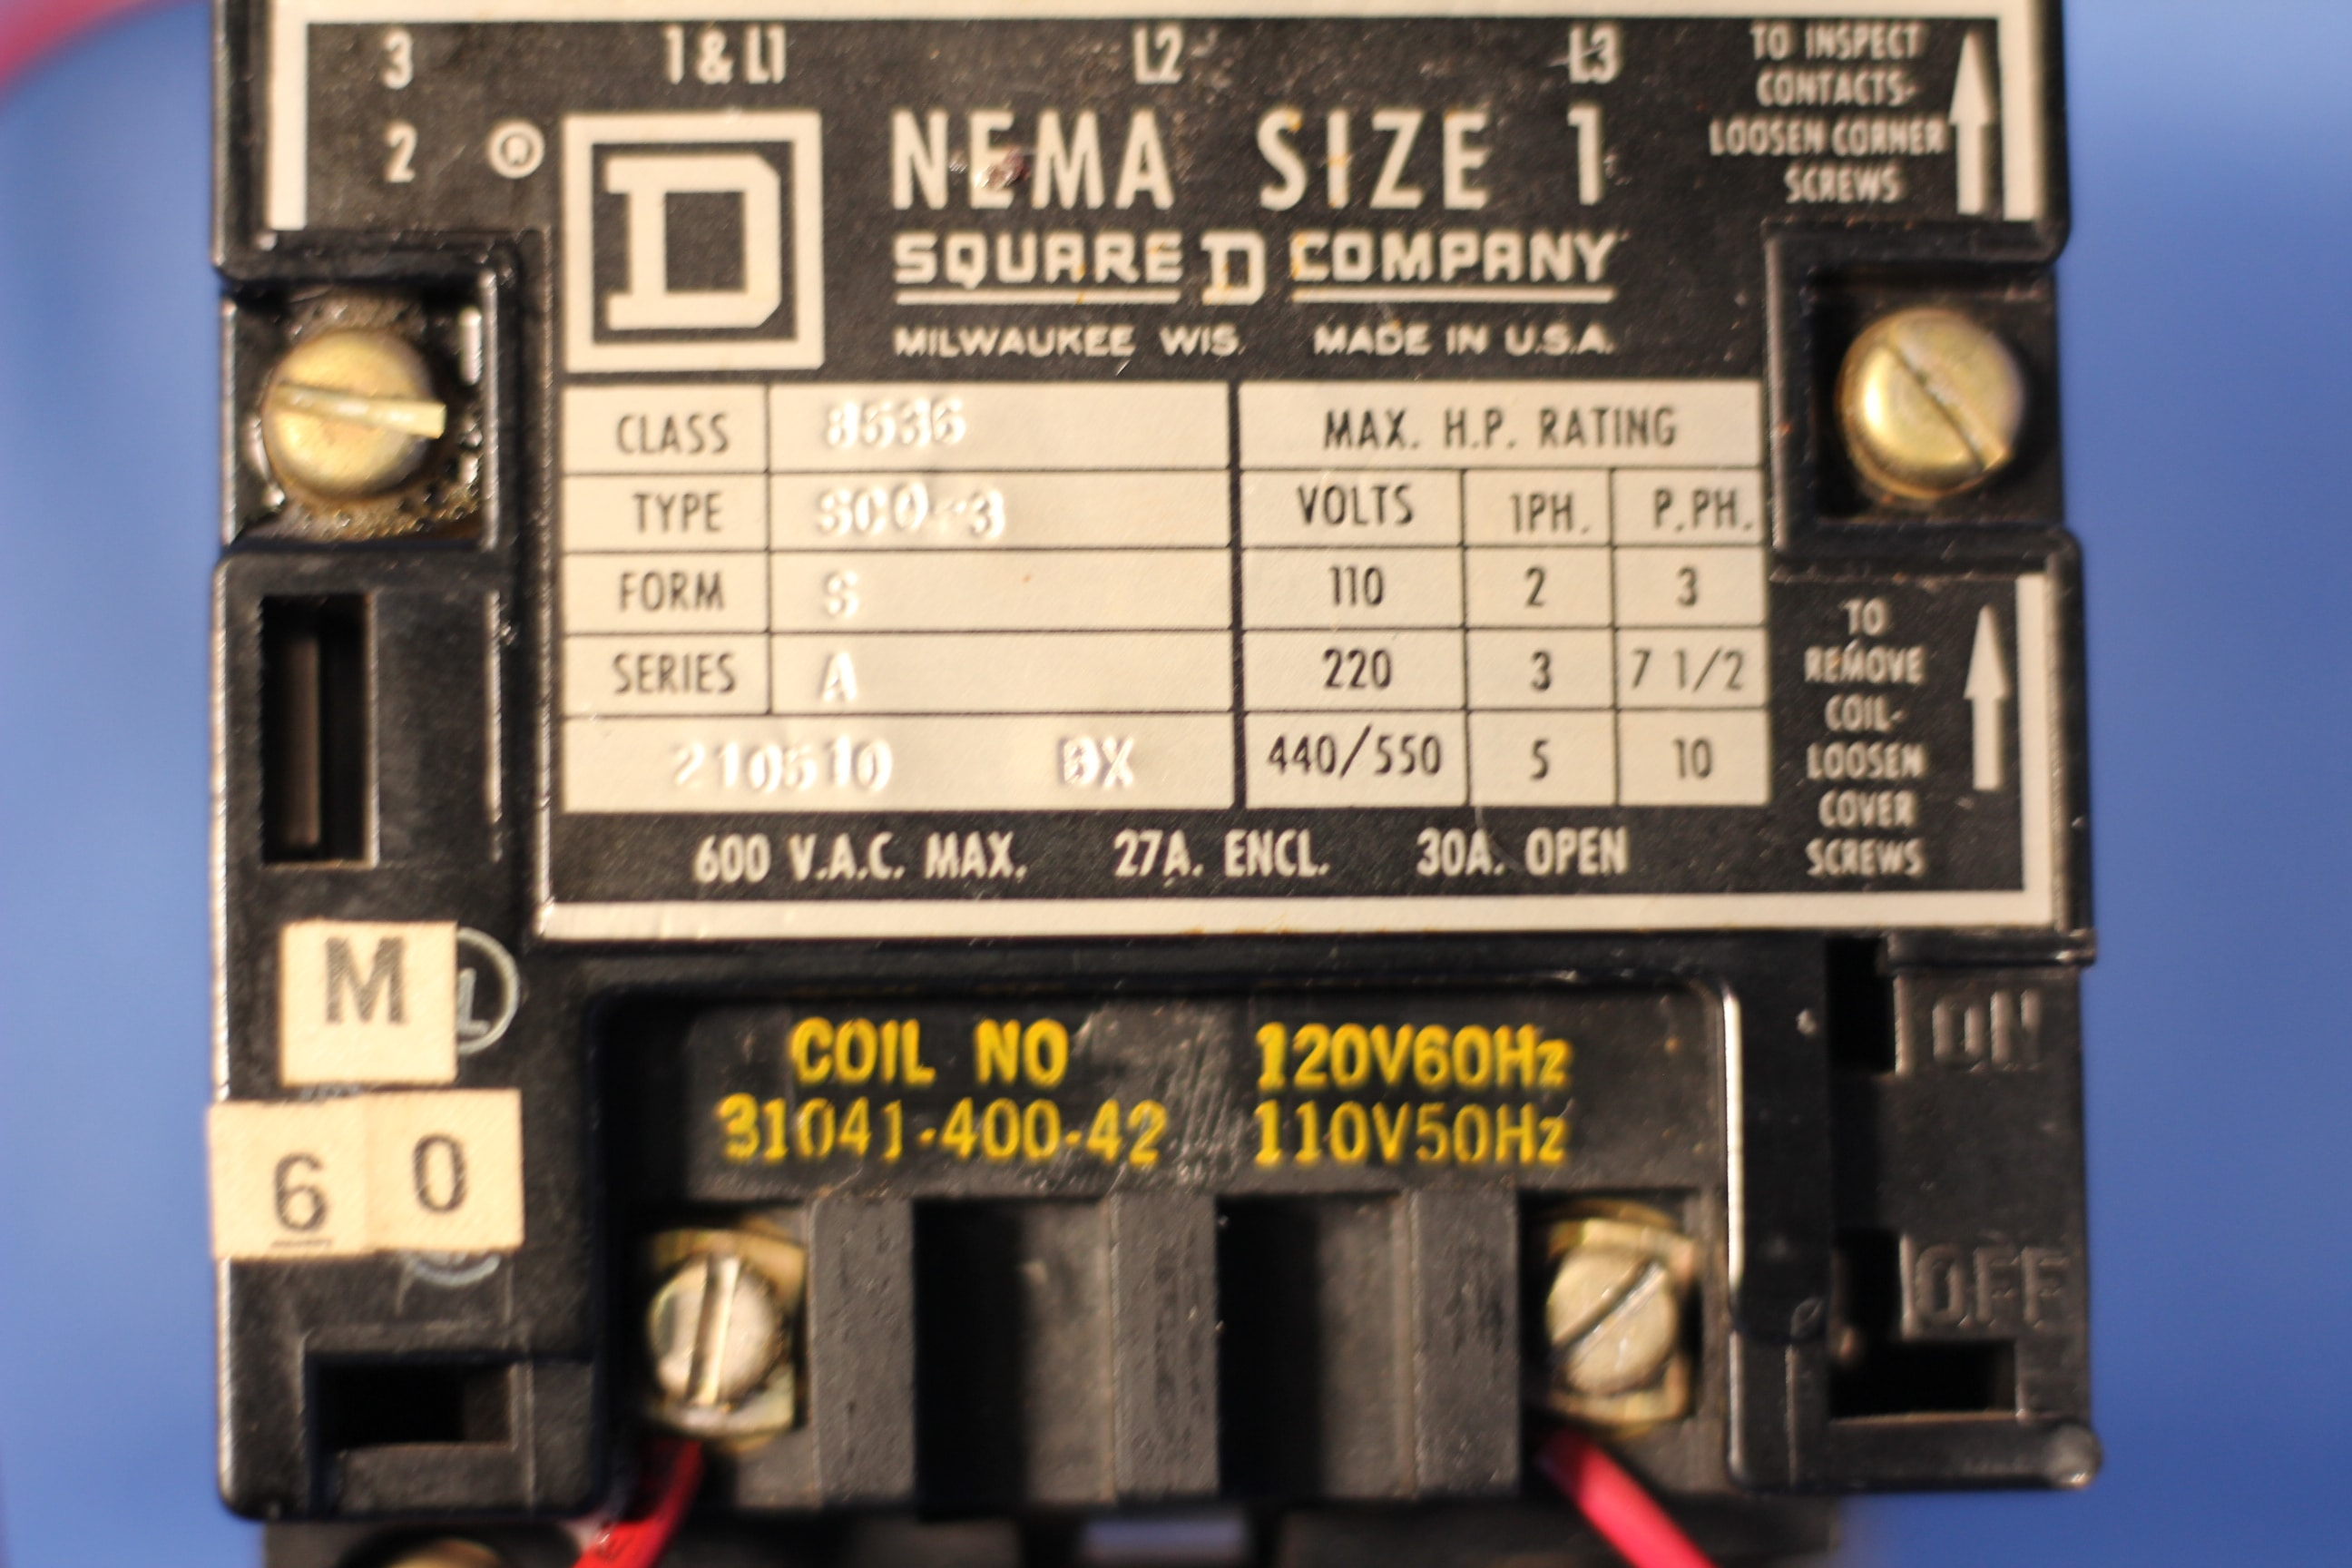 Square D 8536 SC0 3 NEMA Size 1 120 V Coil Starter